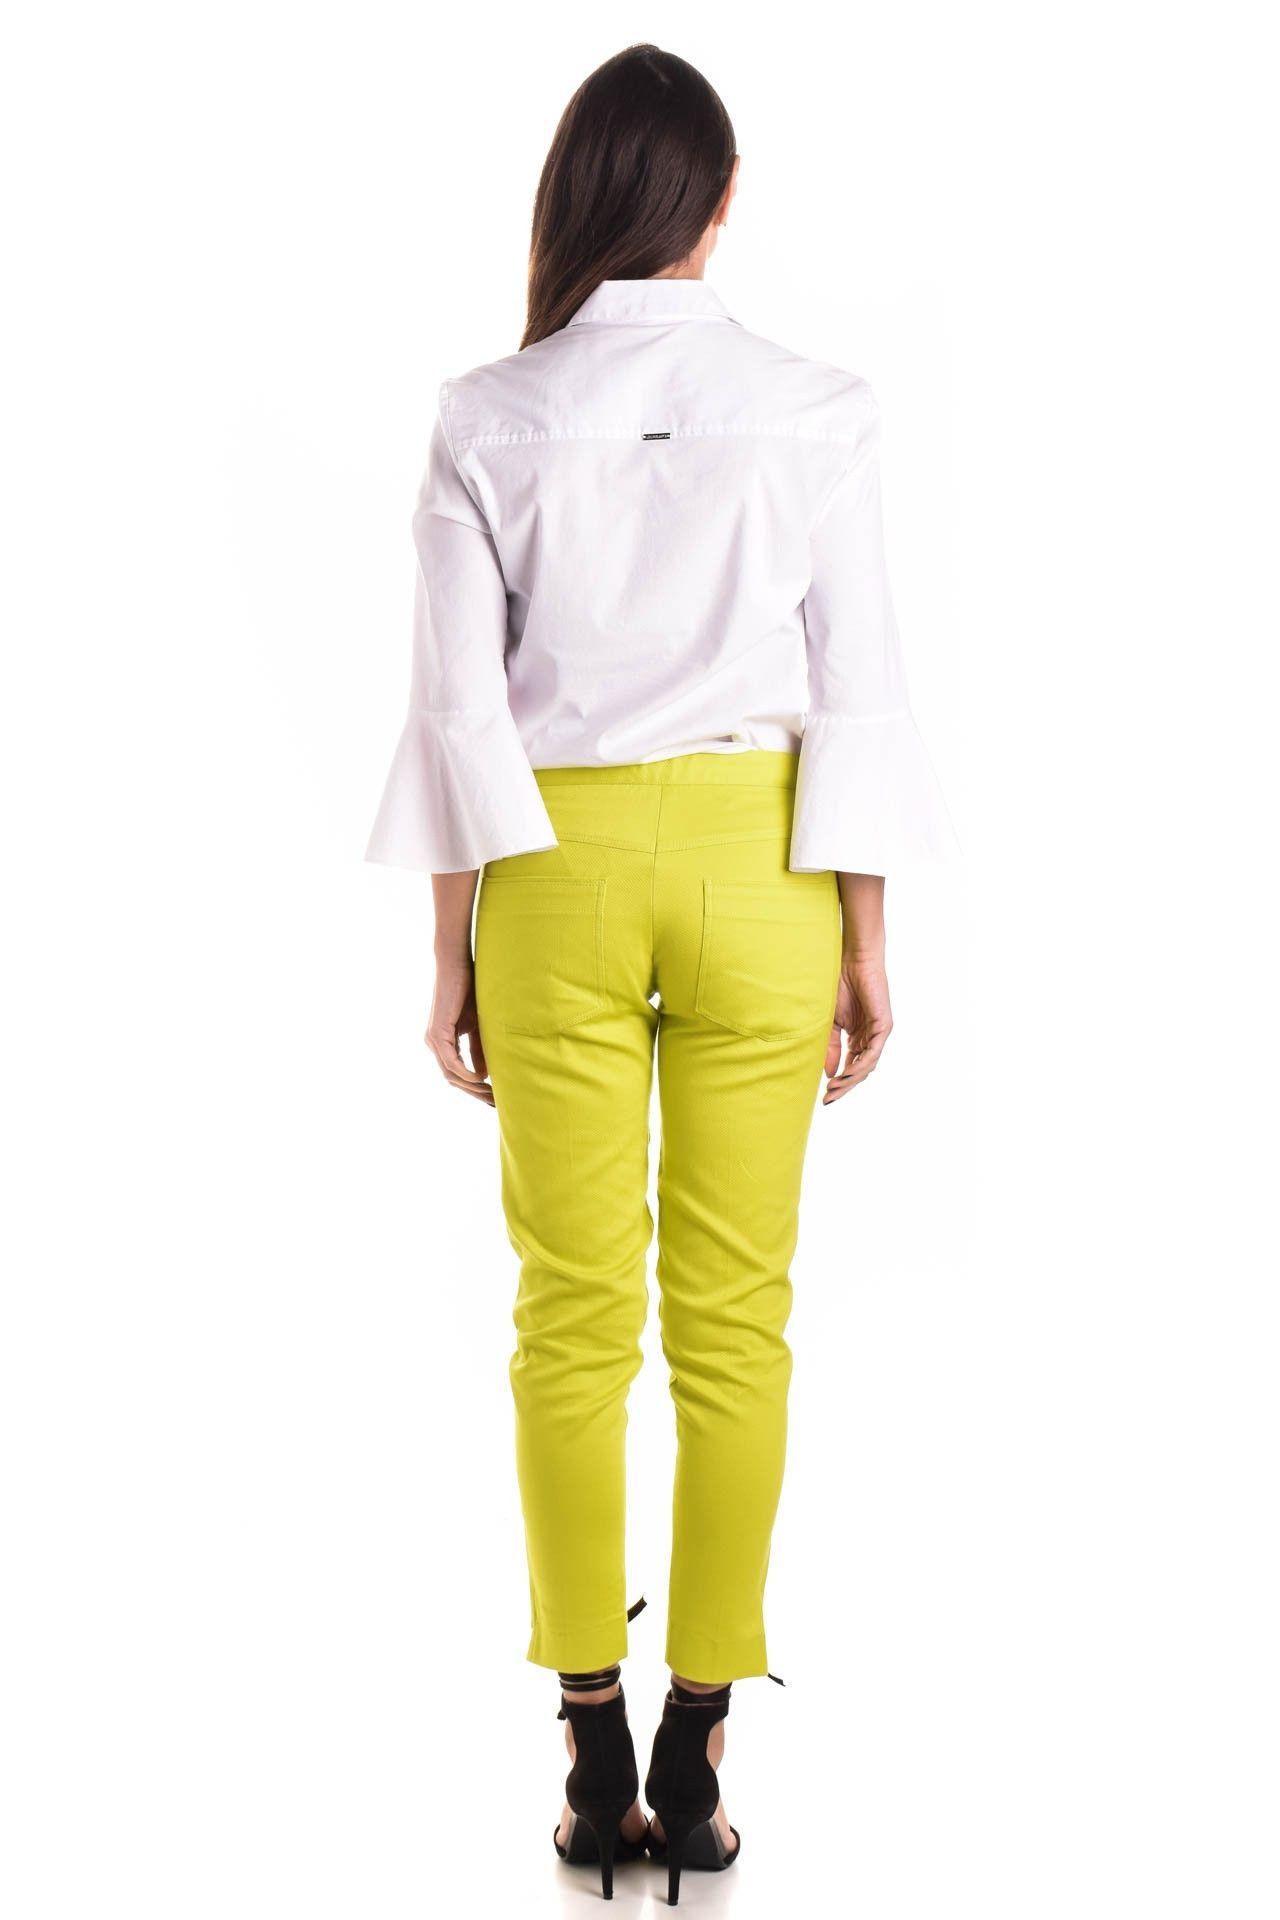 Le Lis Blanc - Calça Textura Verde - Foto 5